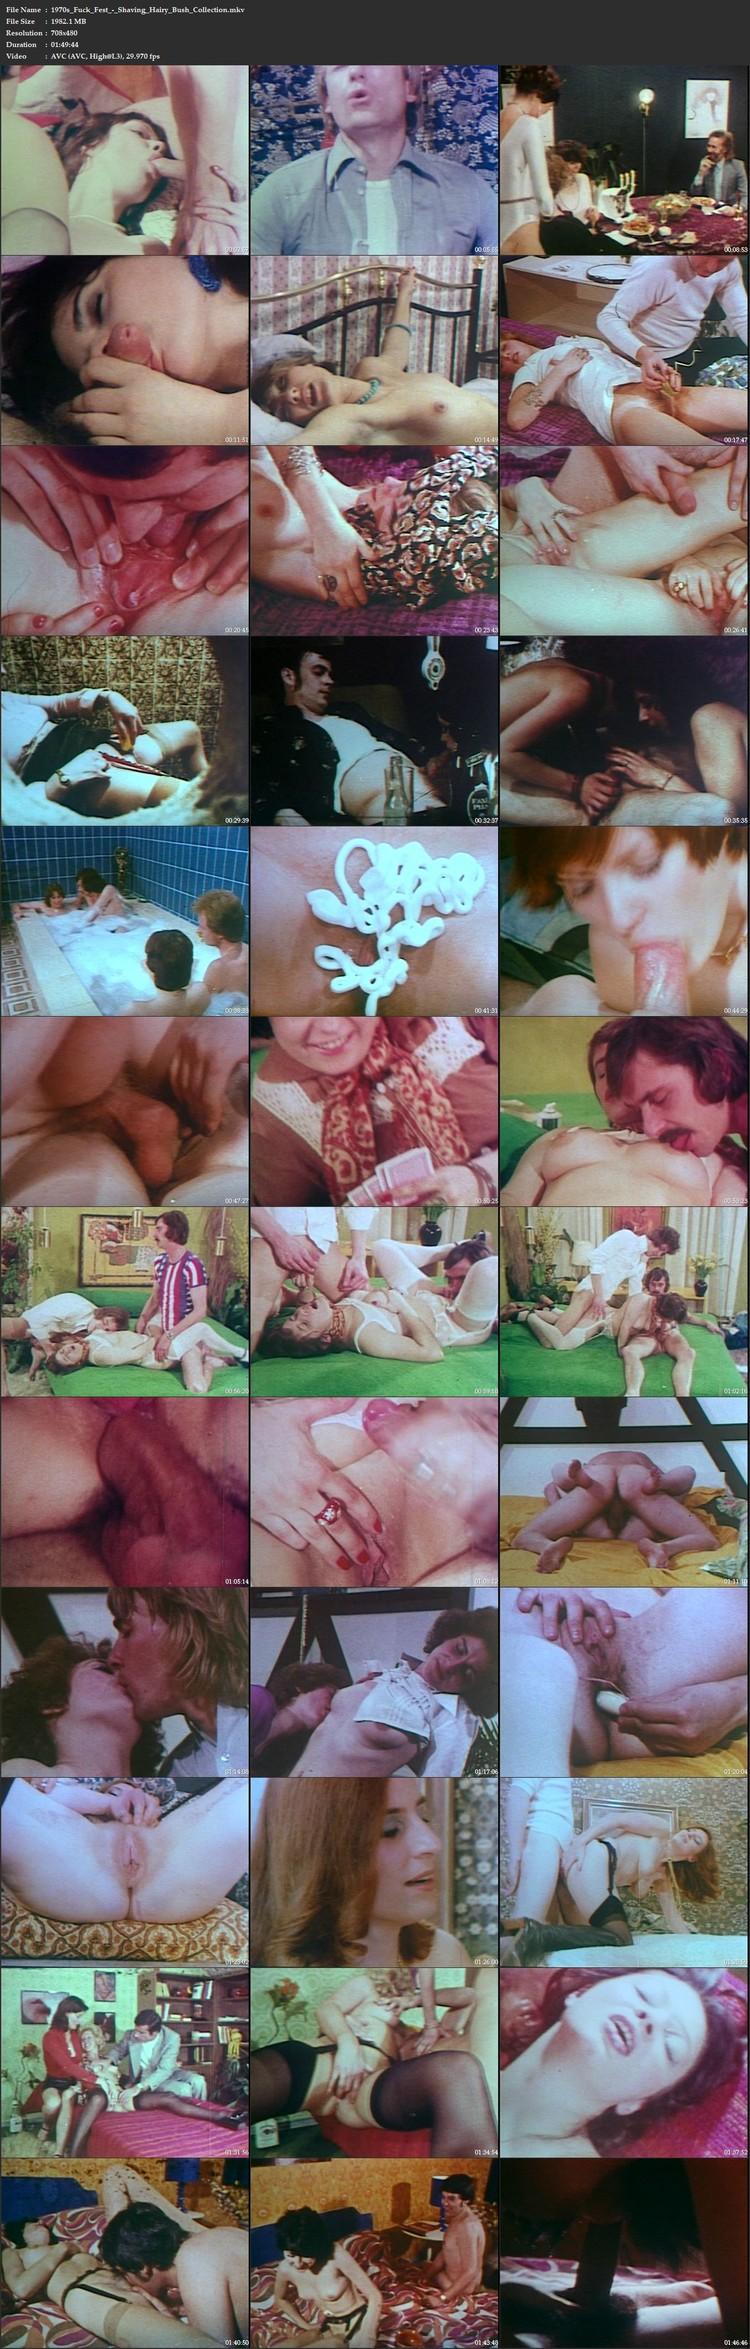 Baby Blue 1979 Порно